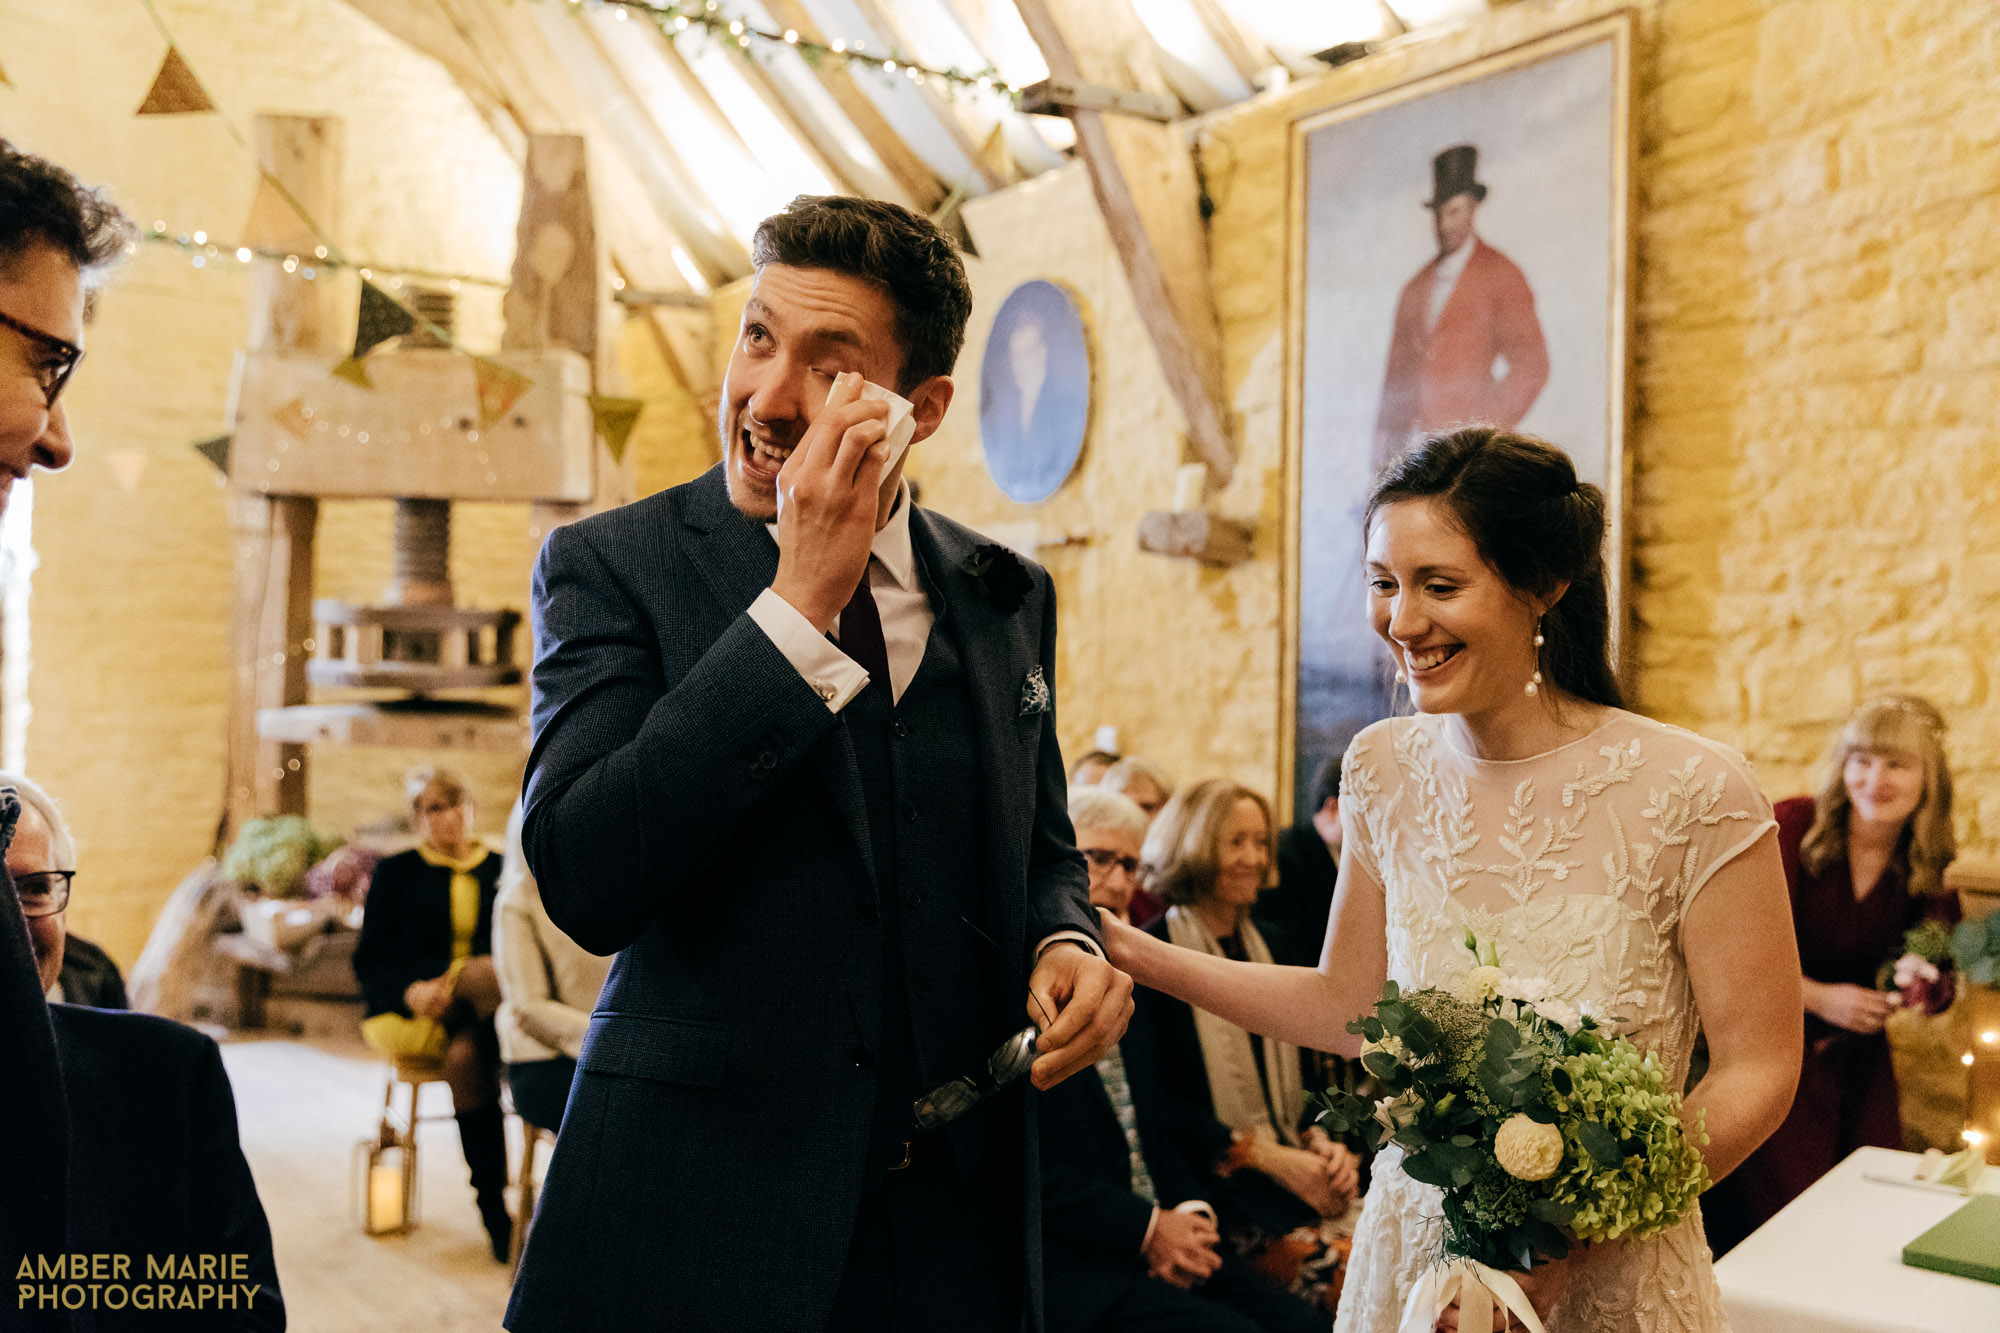 owlpen manor wedding photographer